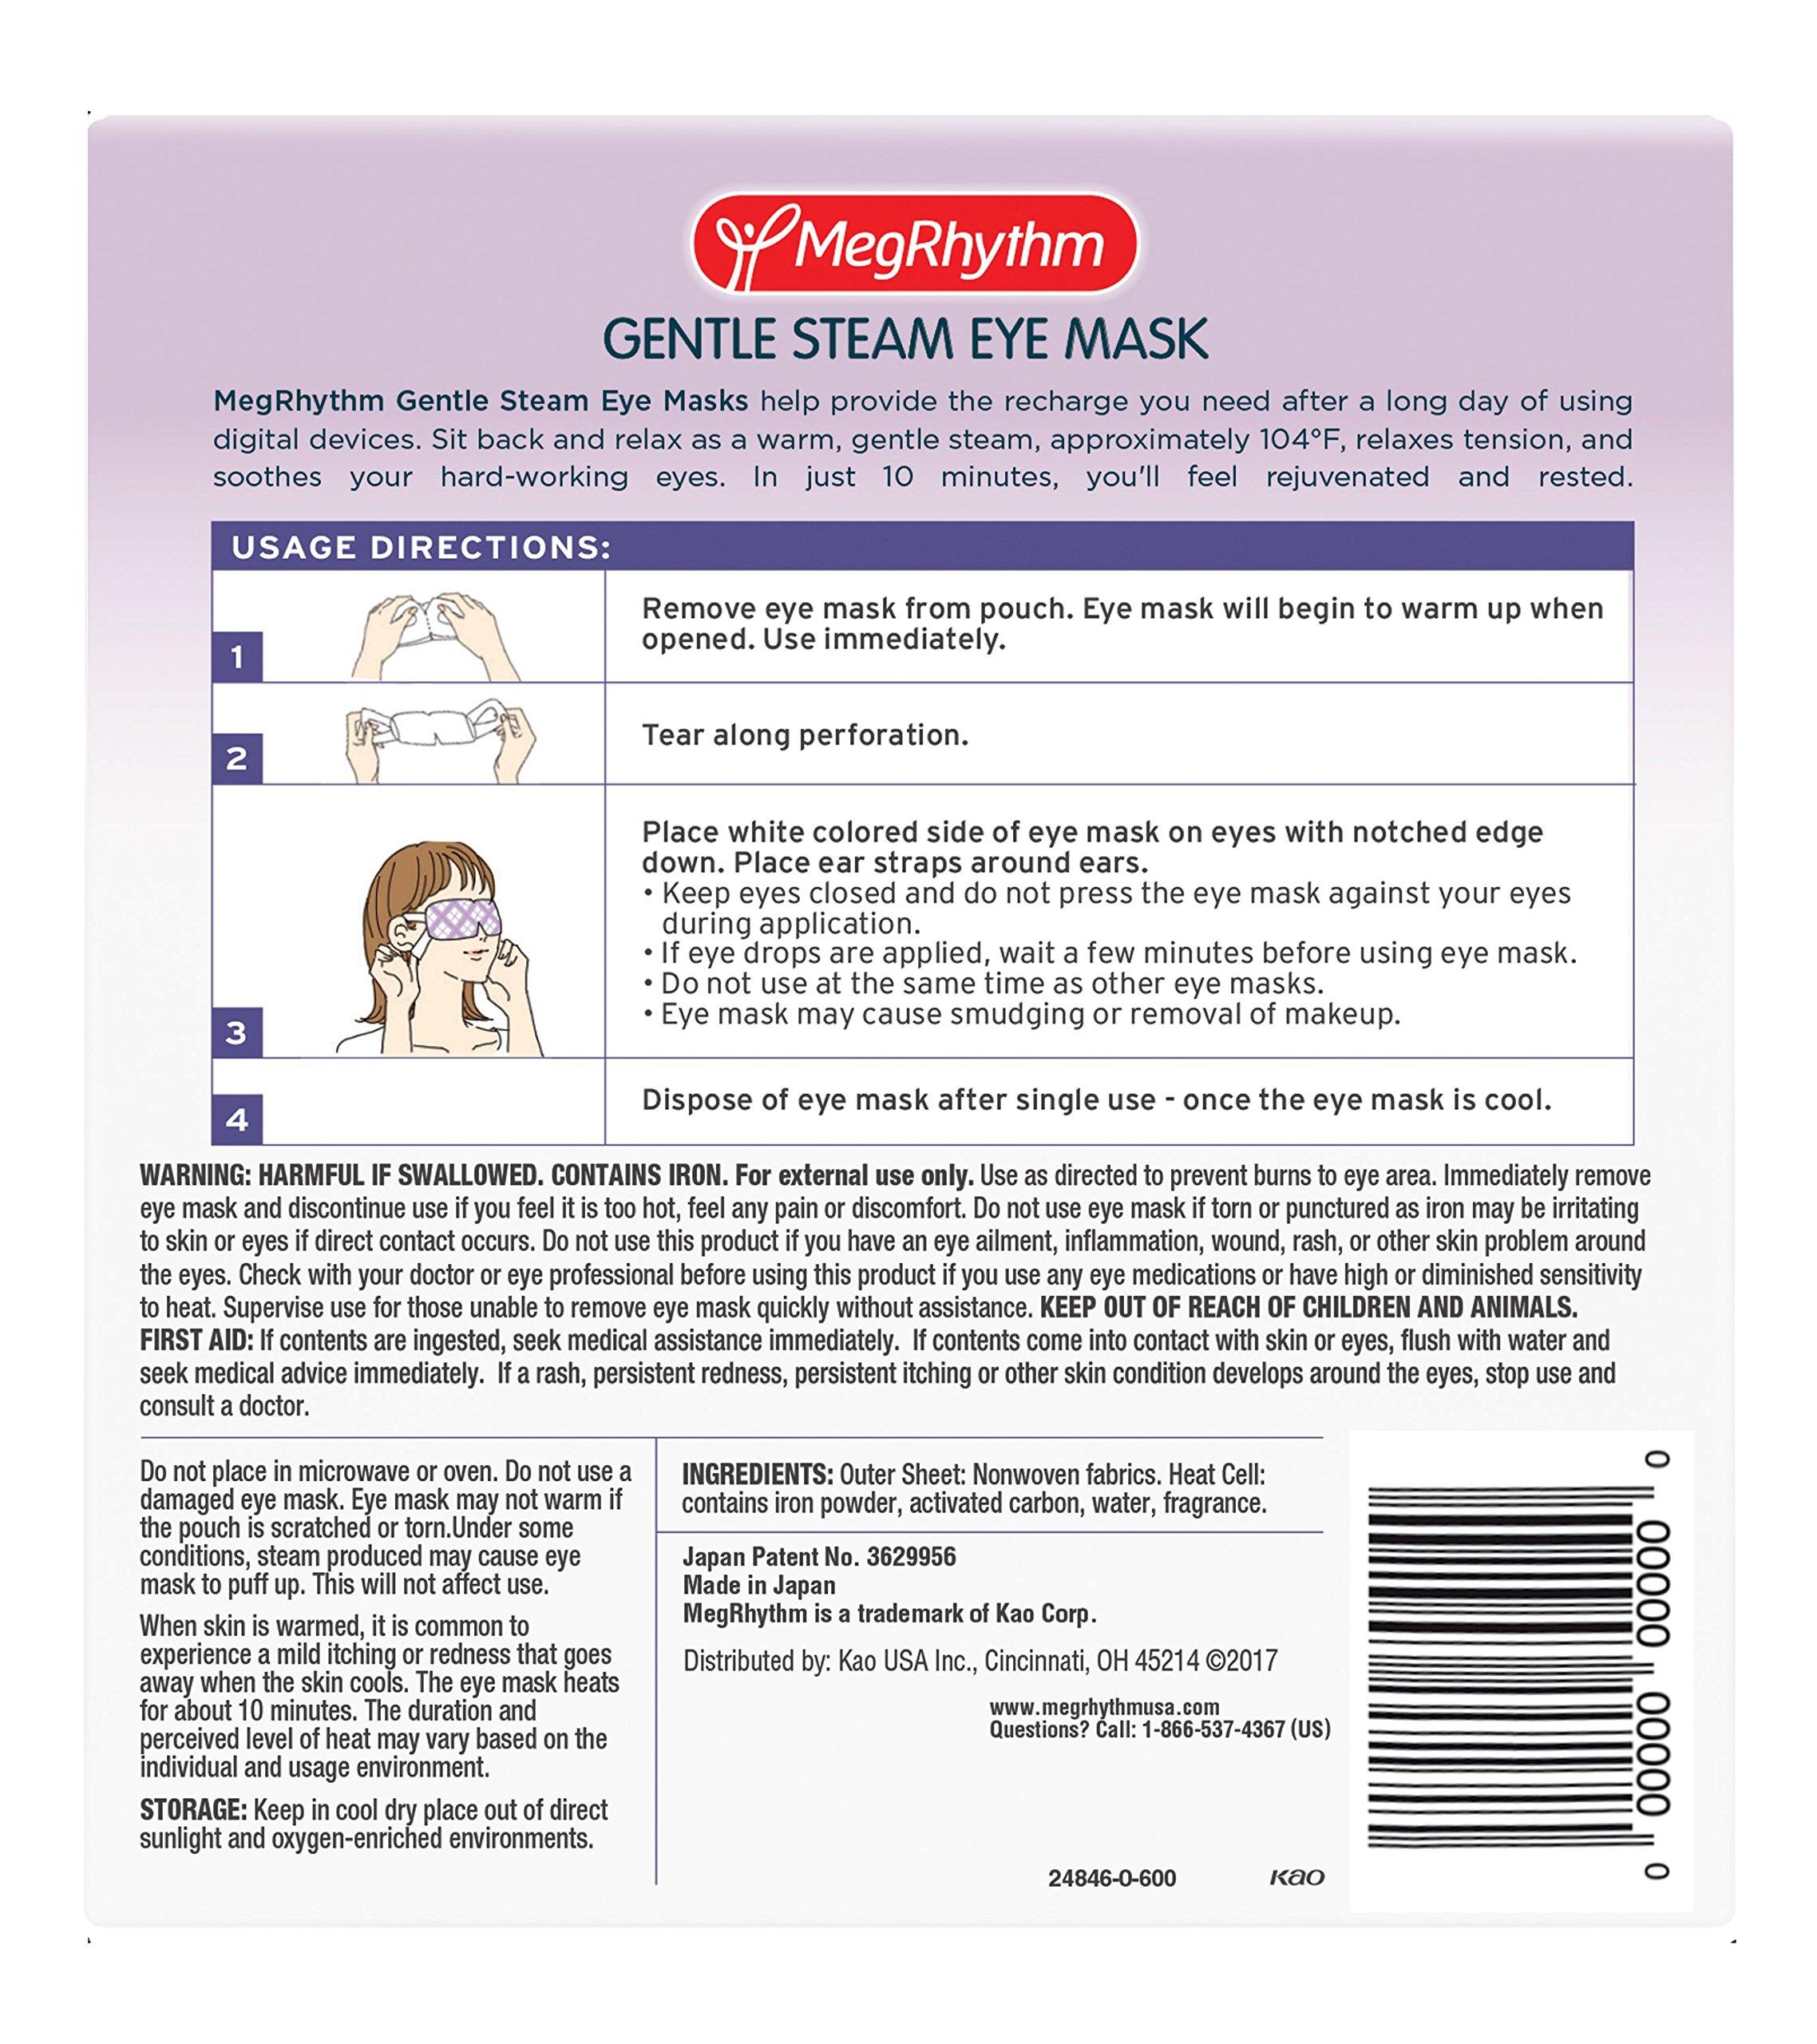 MegRhythm Gentle Steam Eye Mask, Lavender, 7 Count by MegRhythm (Image #2)